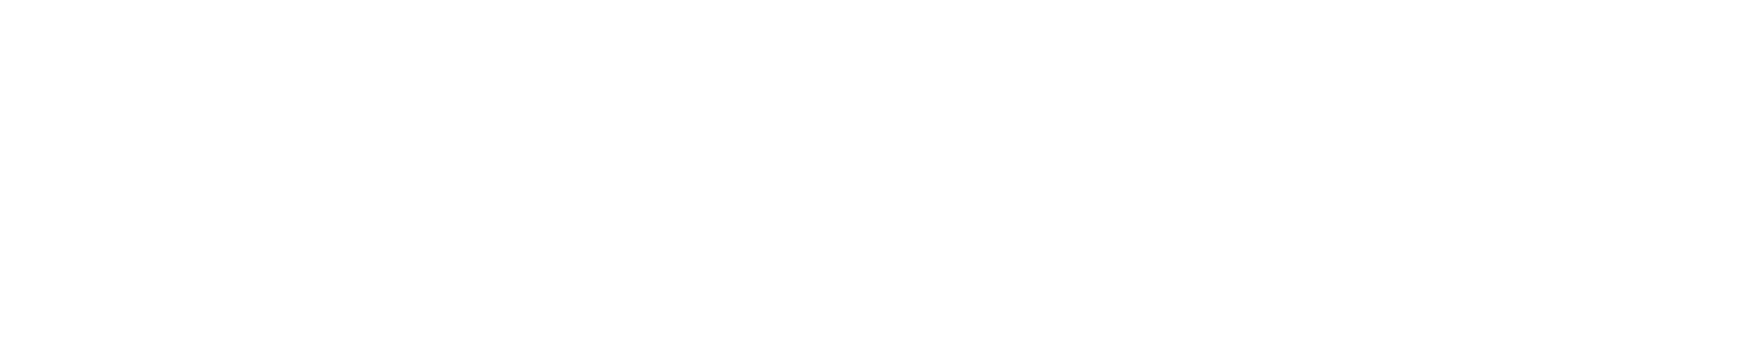 ЭМУП Жилкомхоз